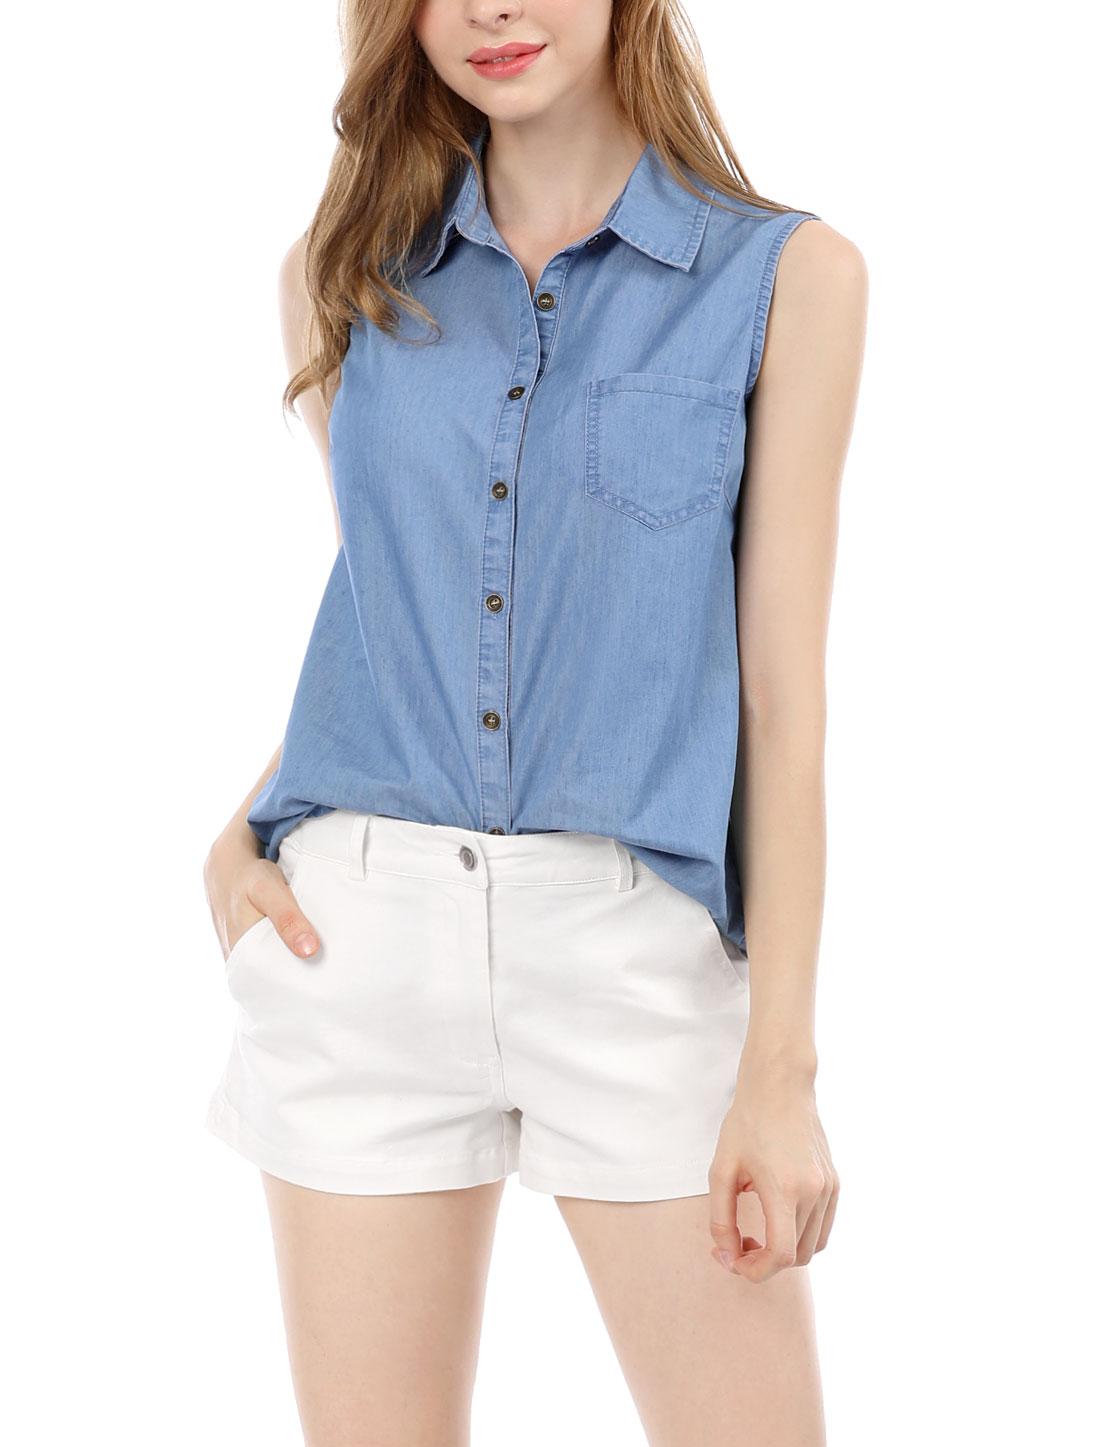 Allegra K Women Single Breasted Collar Sleeveless Shirt Blue L